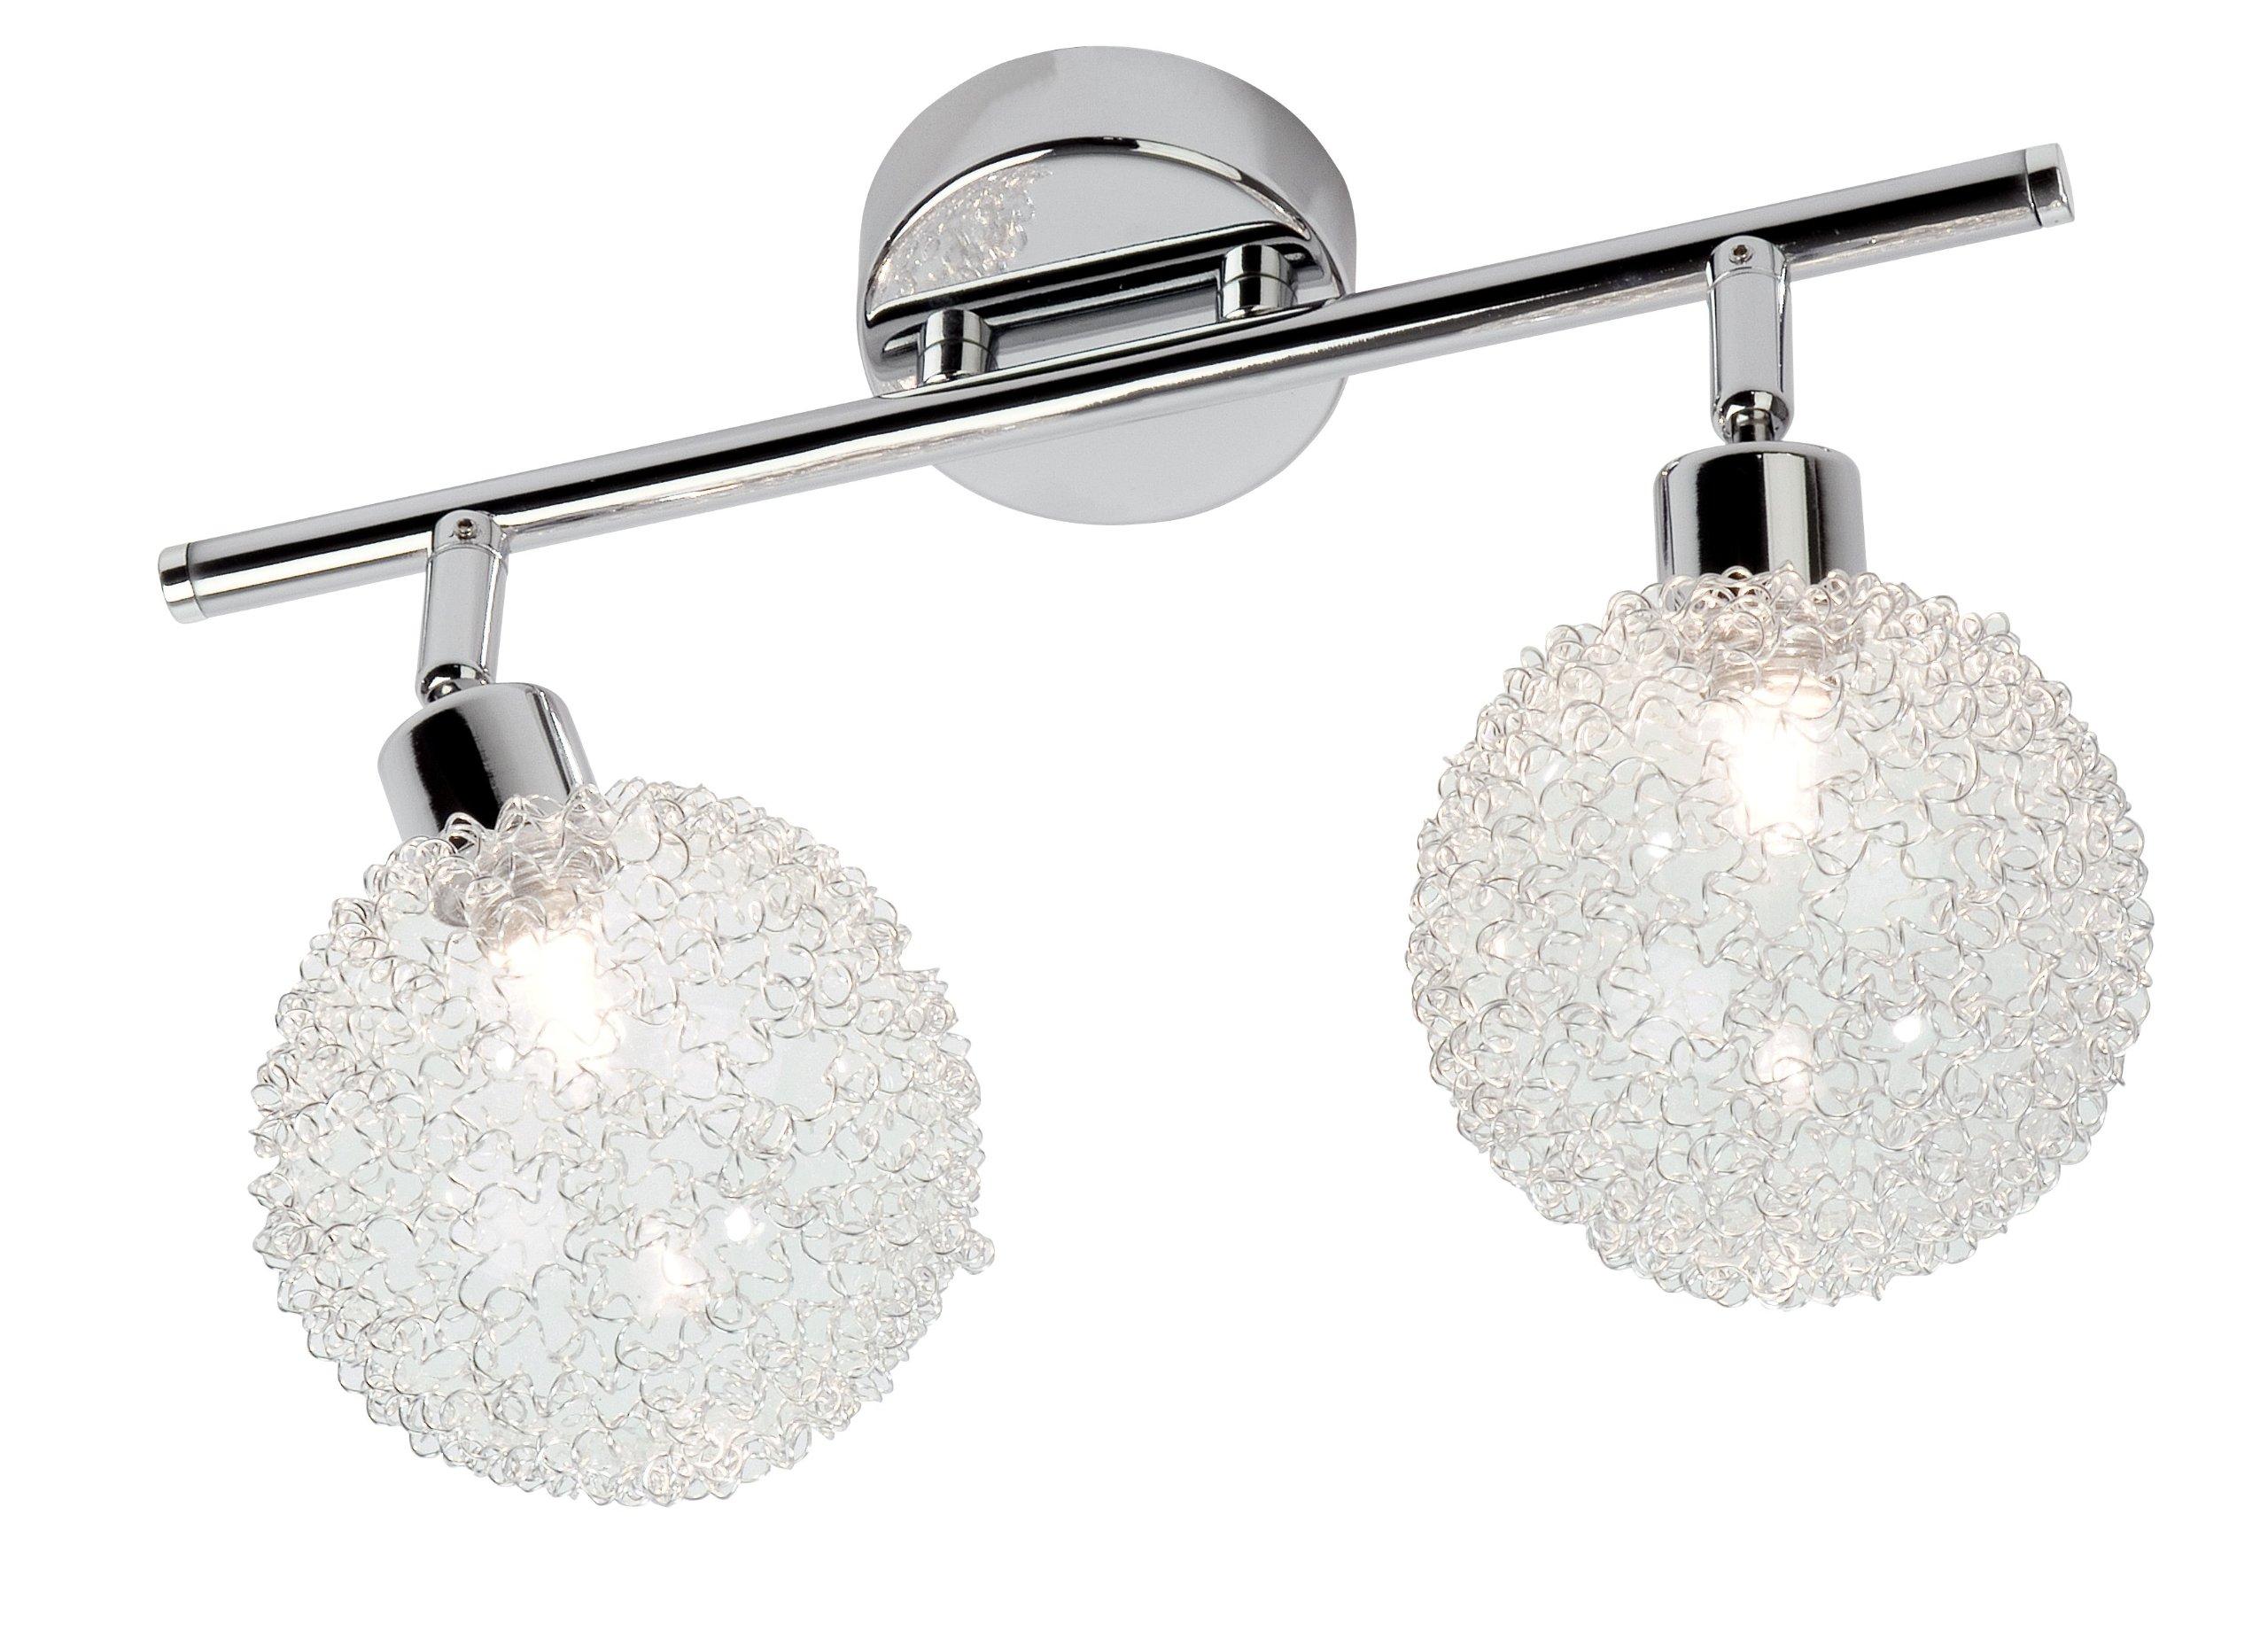 Plafoniere Ikea A Muro : I piu votati nella categoria lampade a sospensione lampadari e